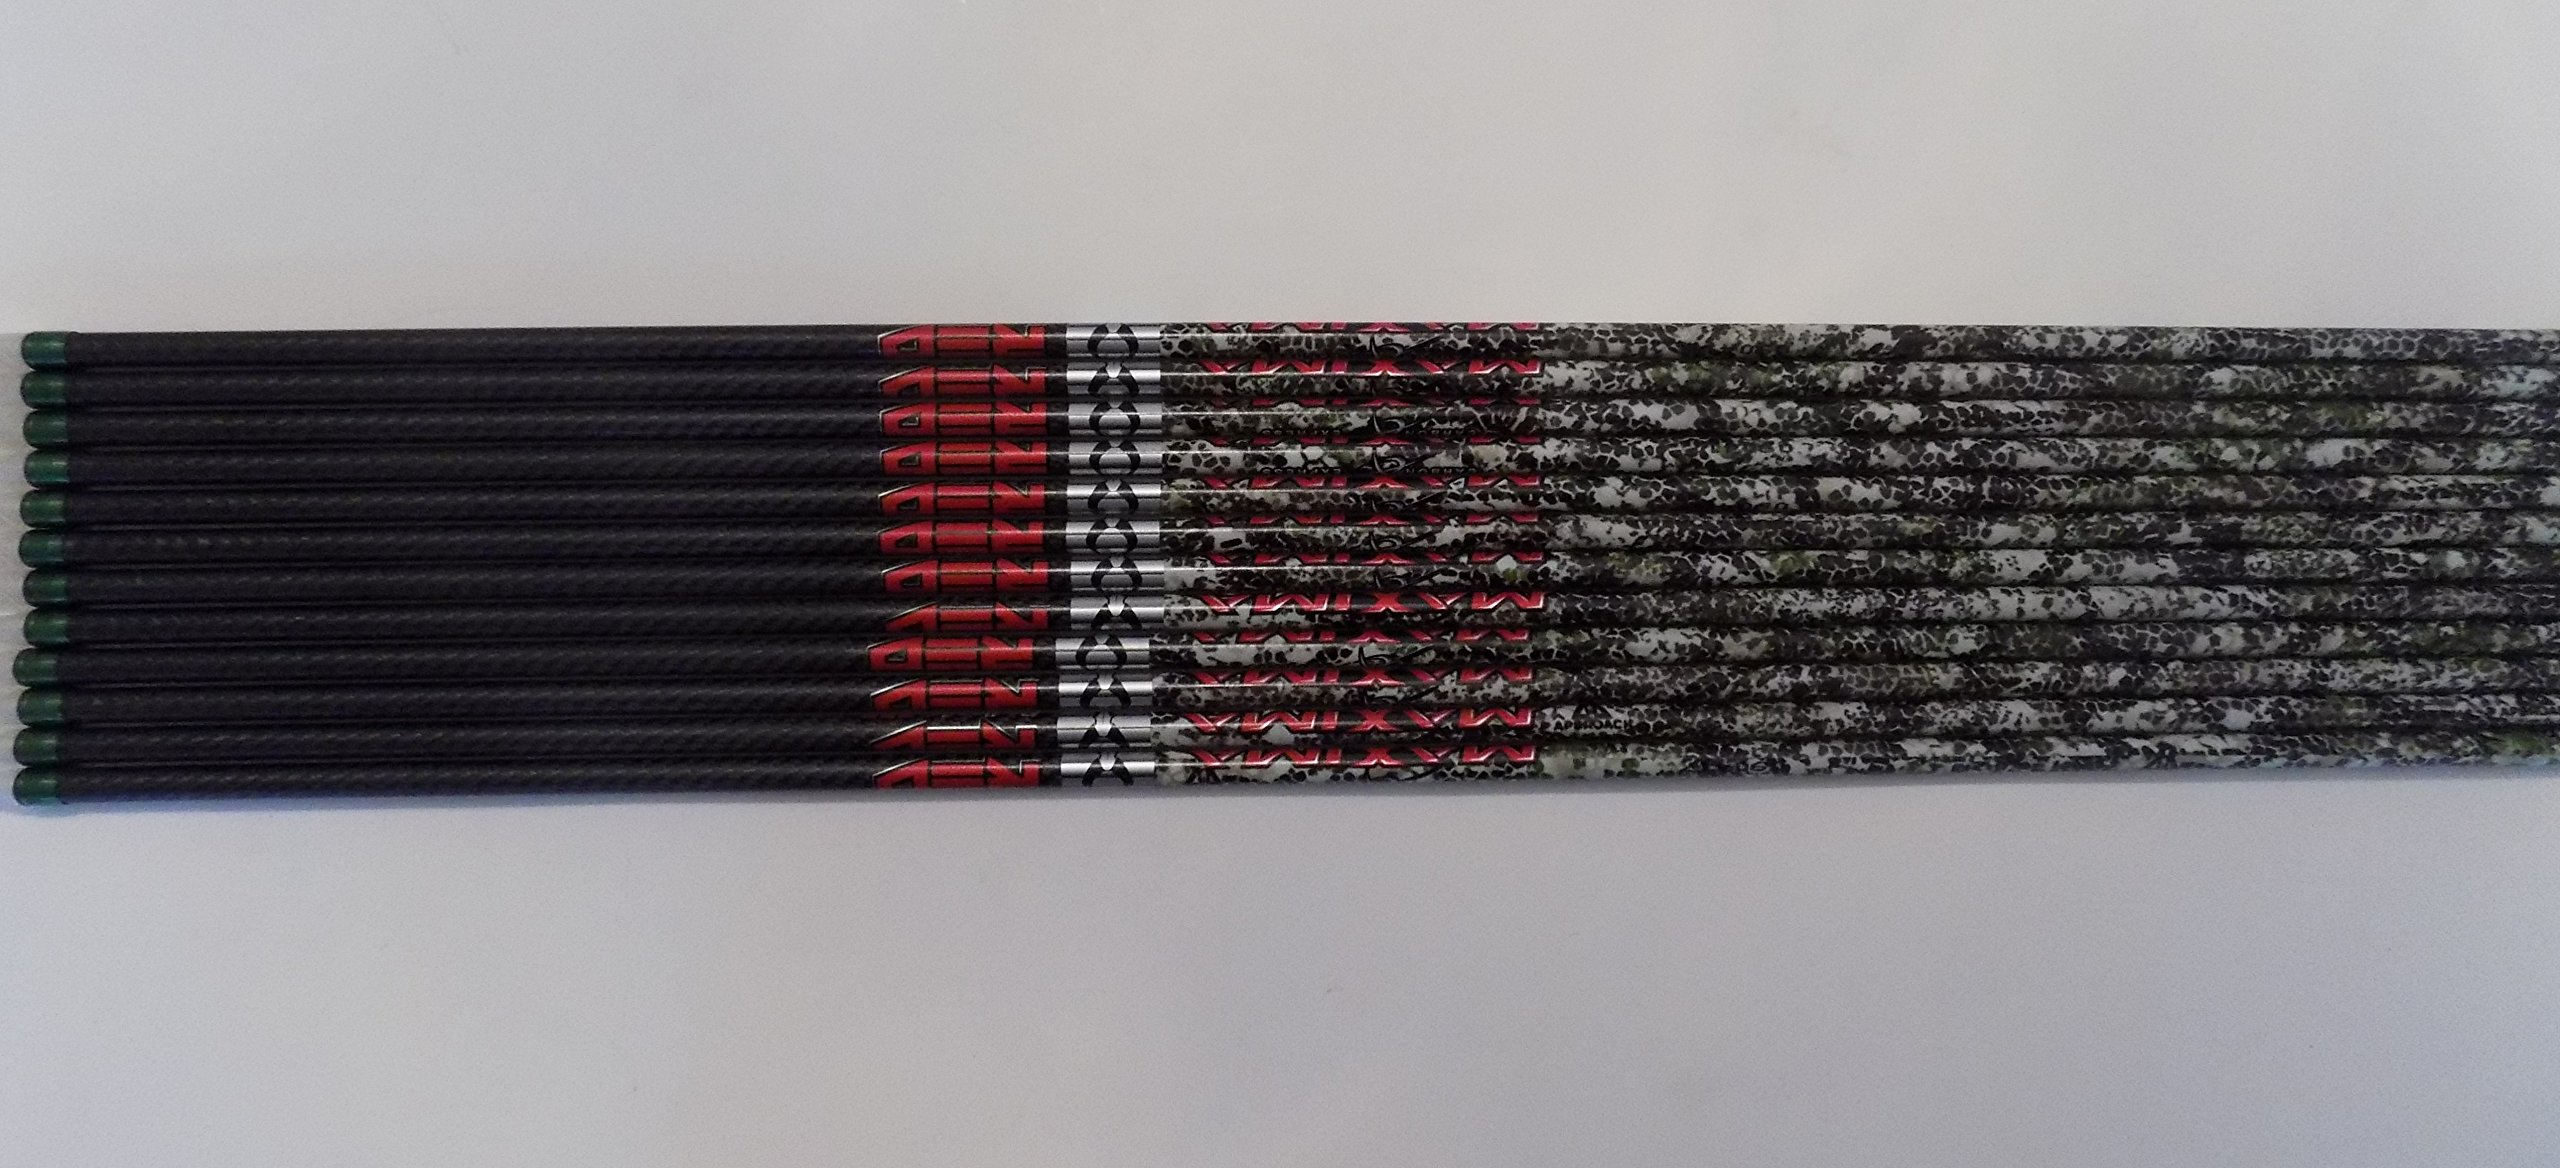 Carbon Express Maxima Red Badlands SD 350 Carbon Arrows Bullseye Green Spray Wraps w/Blazer Vanes 1 Dz.